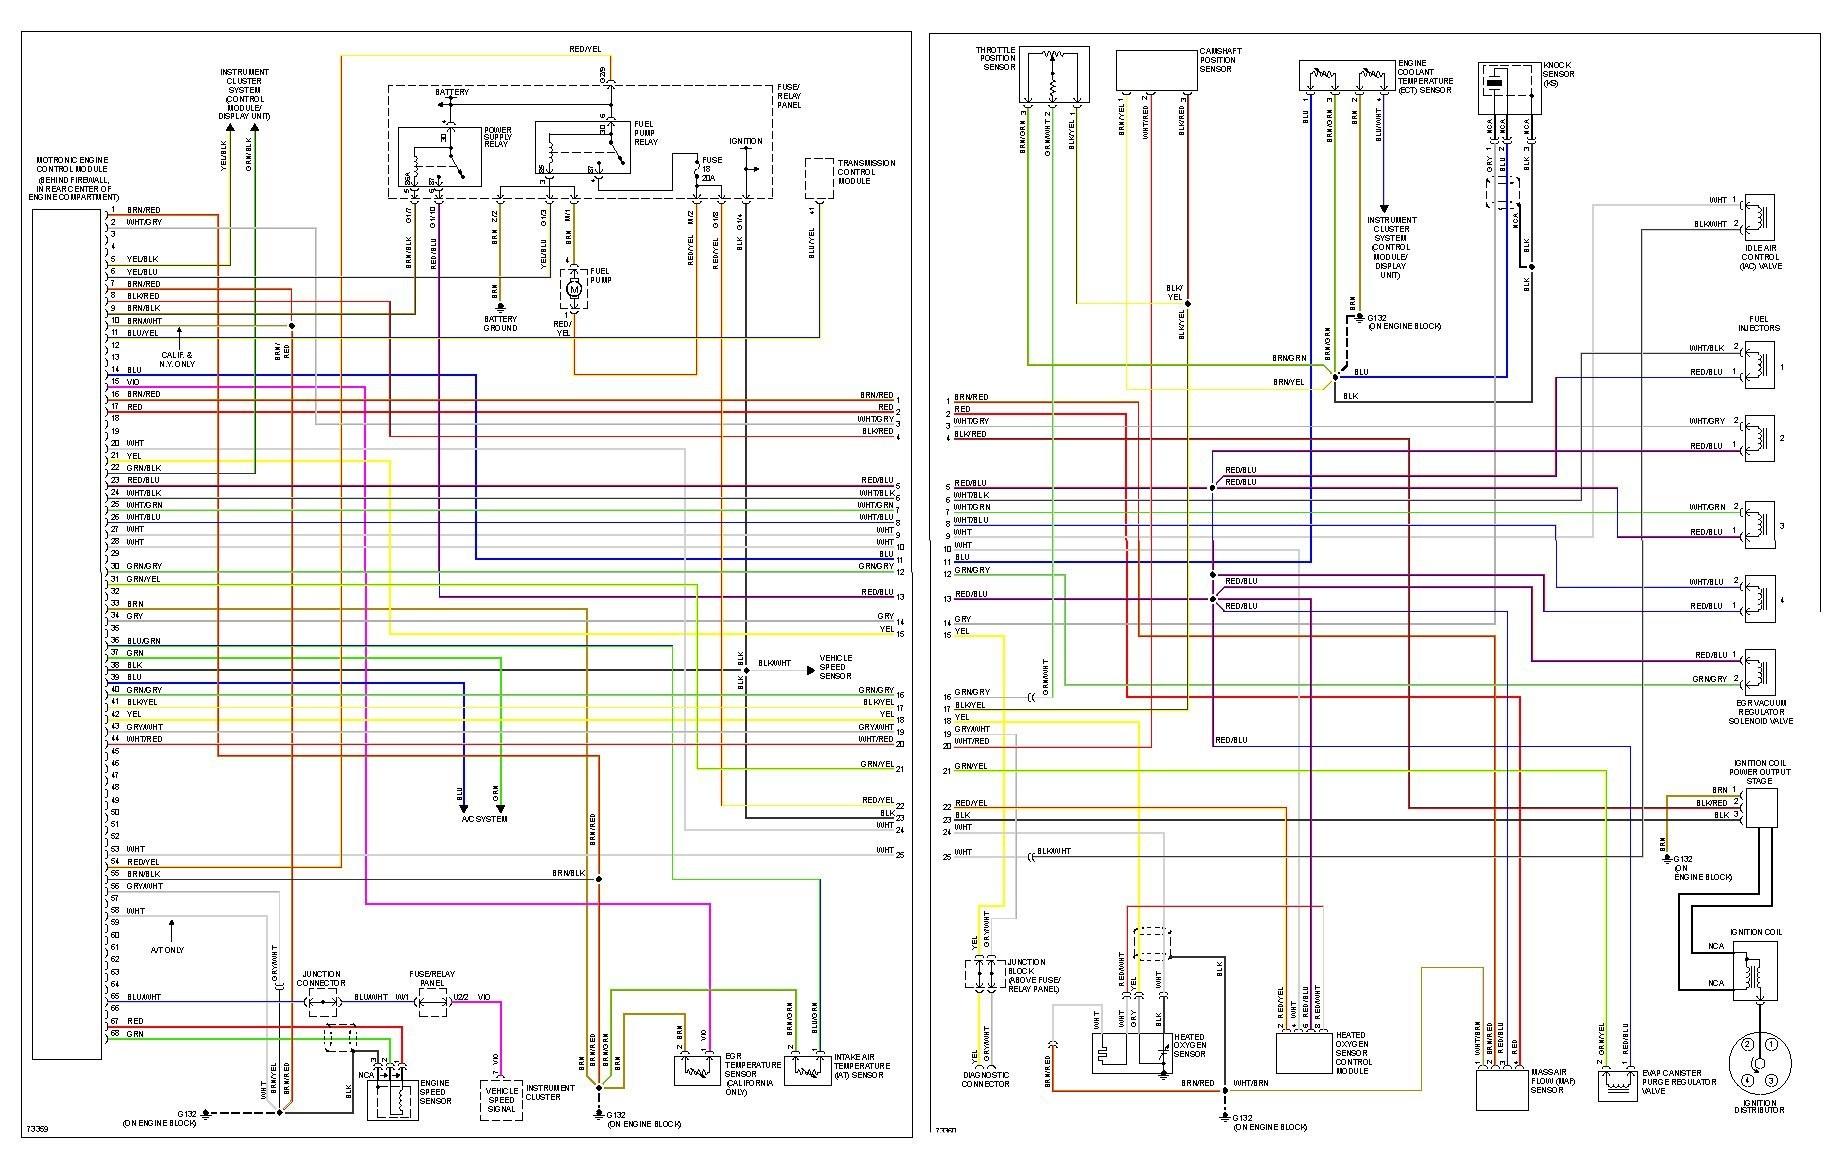 2000 Vw Jetta 2 0 Engine Diagram 2 Vw Golf Wiring Diagram Wiring Diagram Of 2000 Vw Jetta 2 0 Engine Diagram 2